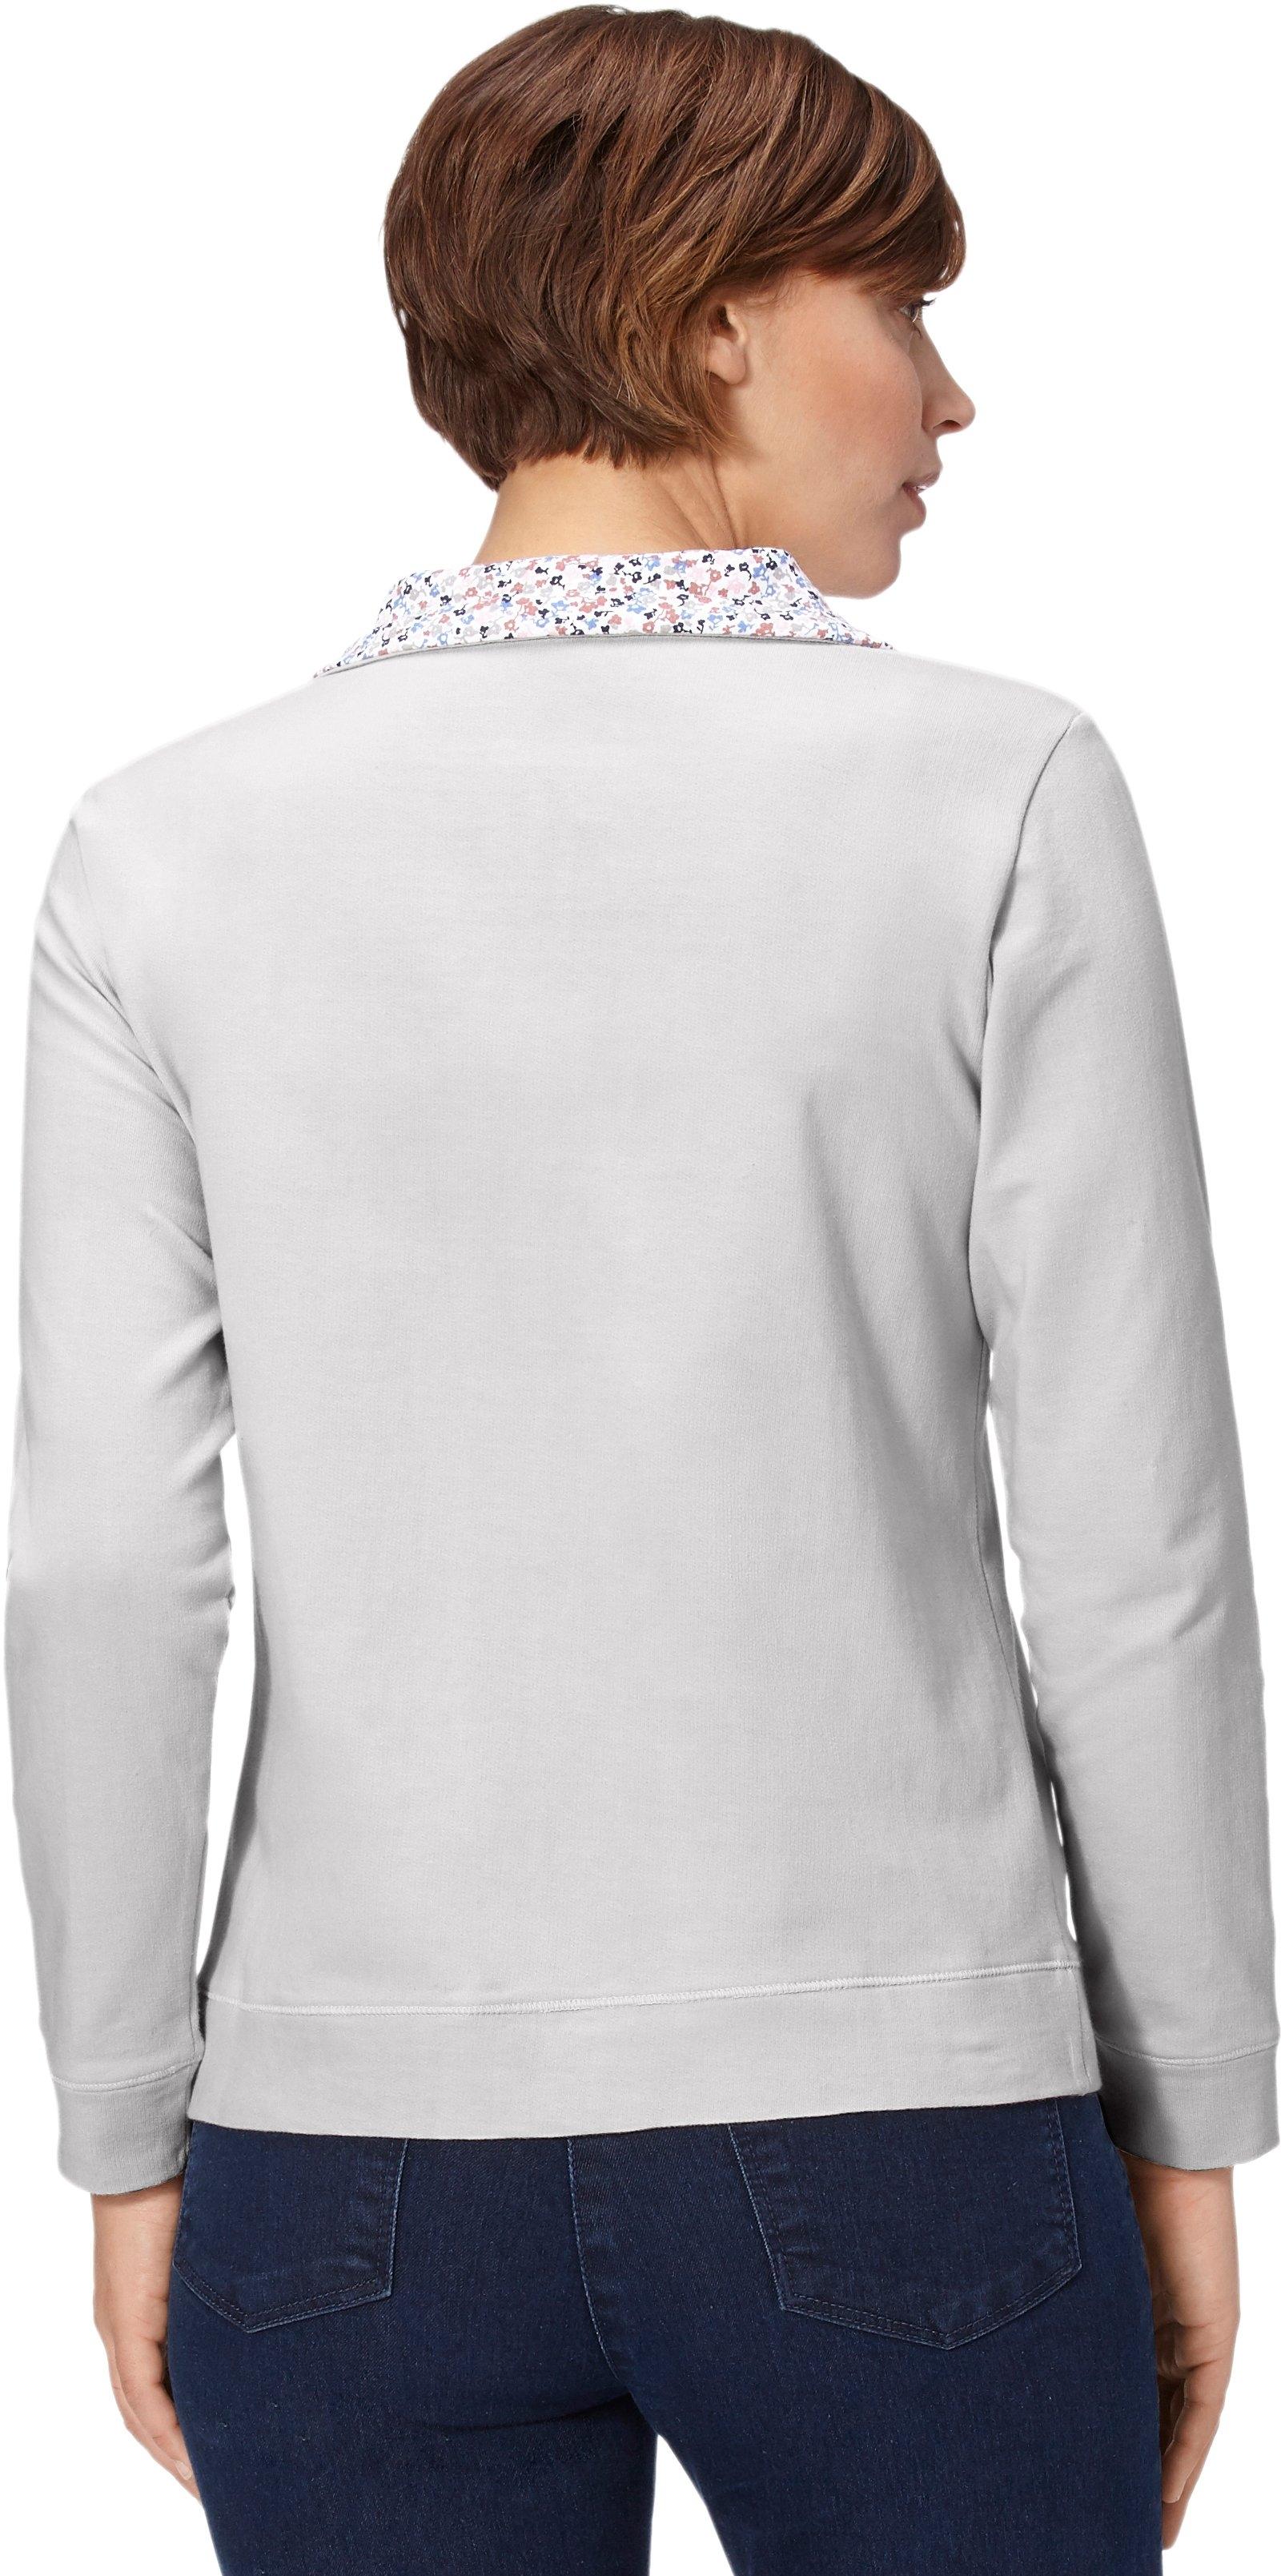 Millefleursstrook Met Kopen Basics Shirtjasje Online Classic OZikXTPu